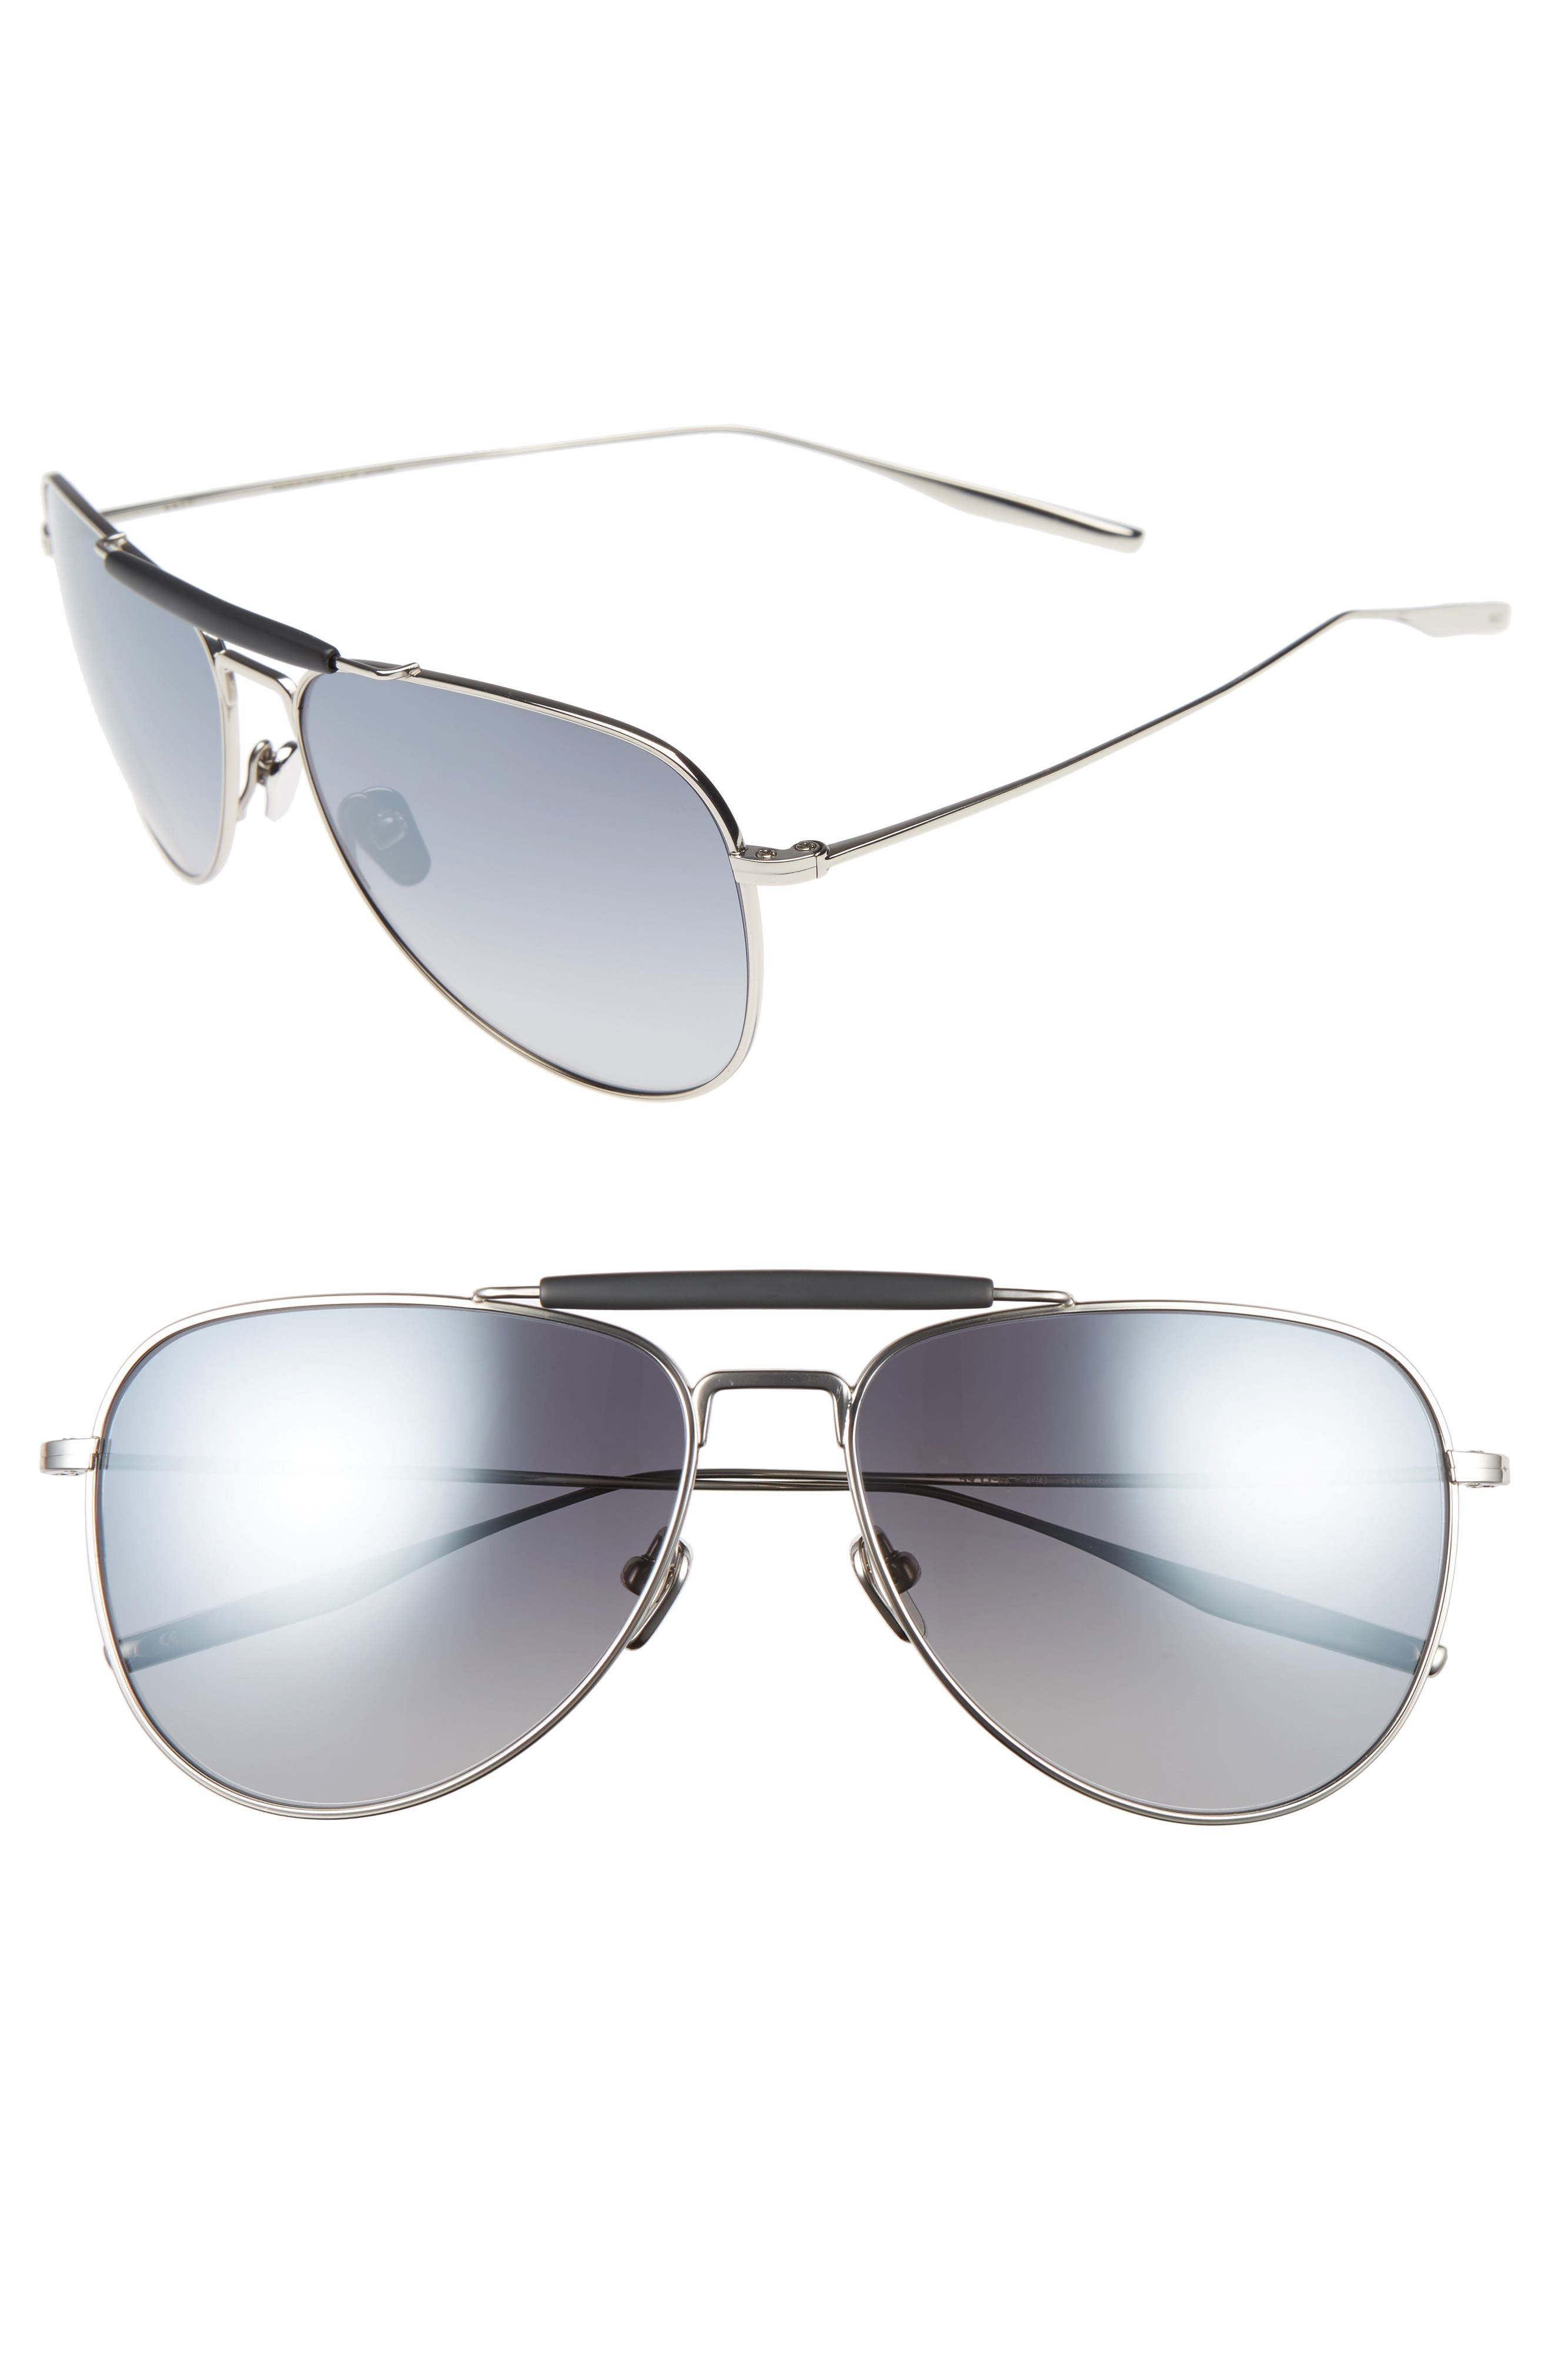 Striker 59mm Aviator Sunglasses,                             Alternate thumbnail 2, color,                             TRADITIONAL SILVER